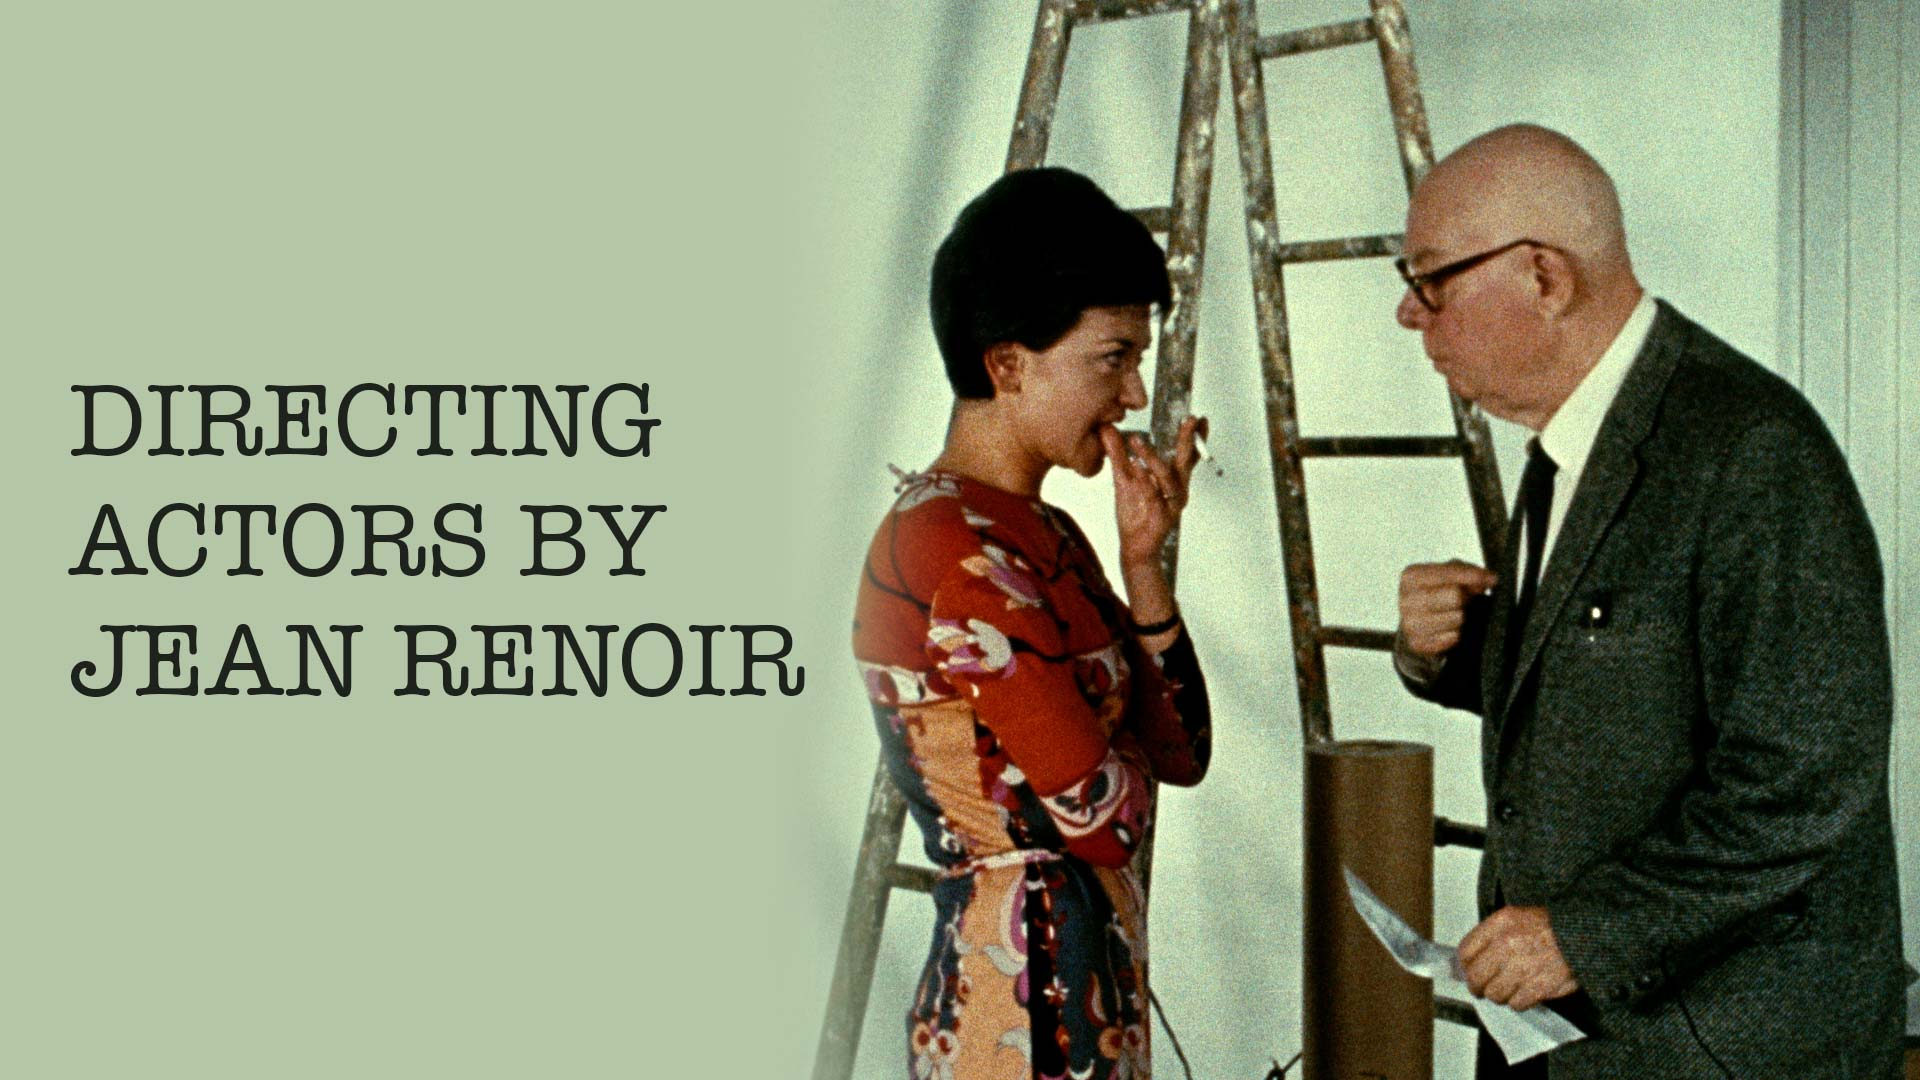 Directing Actors by Jean Renoir - image